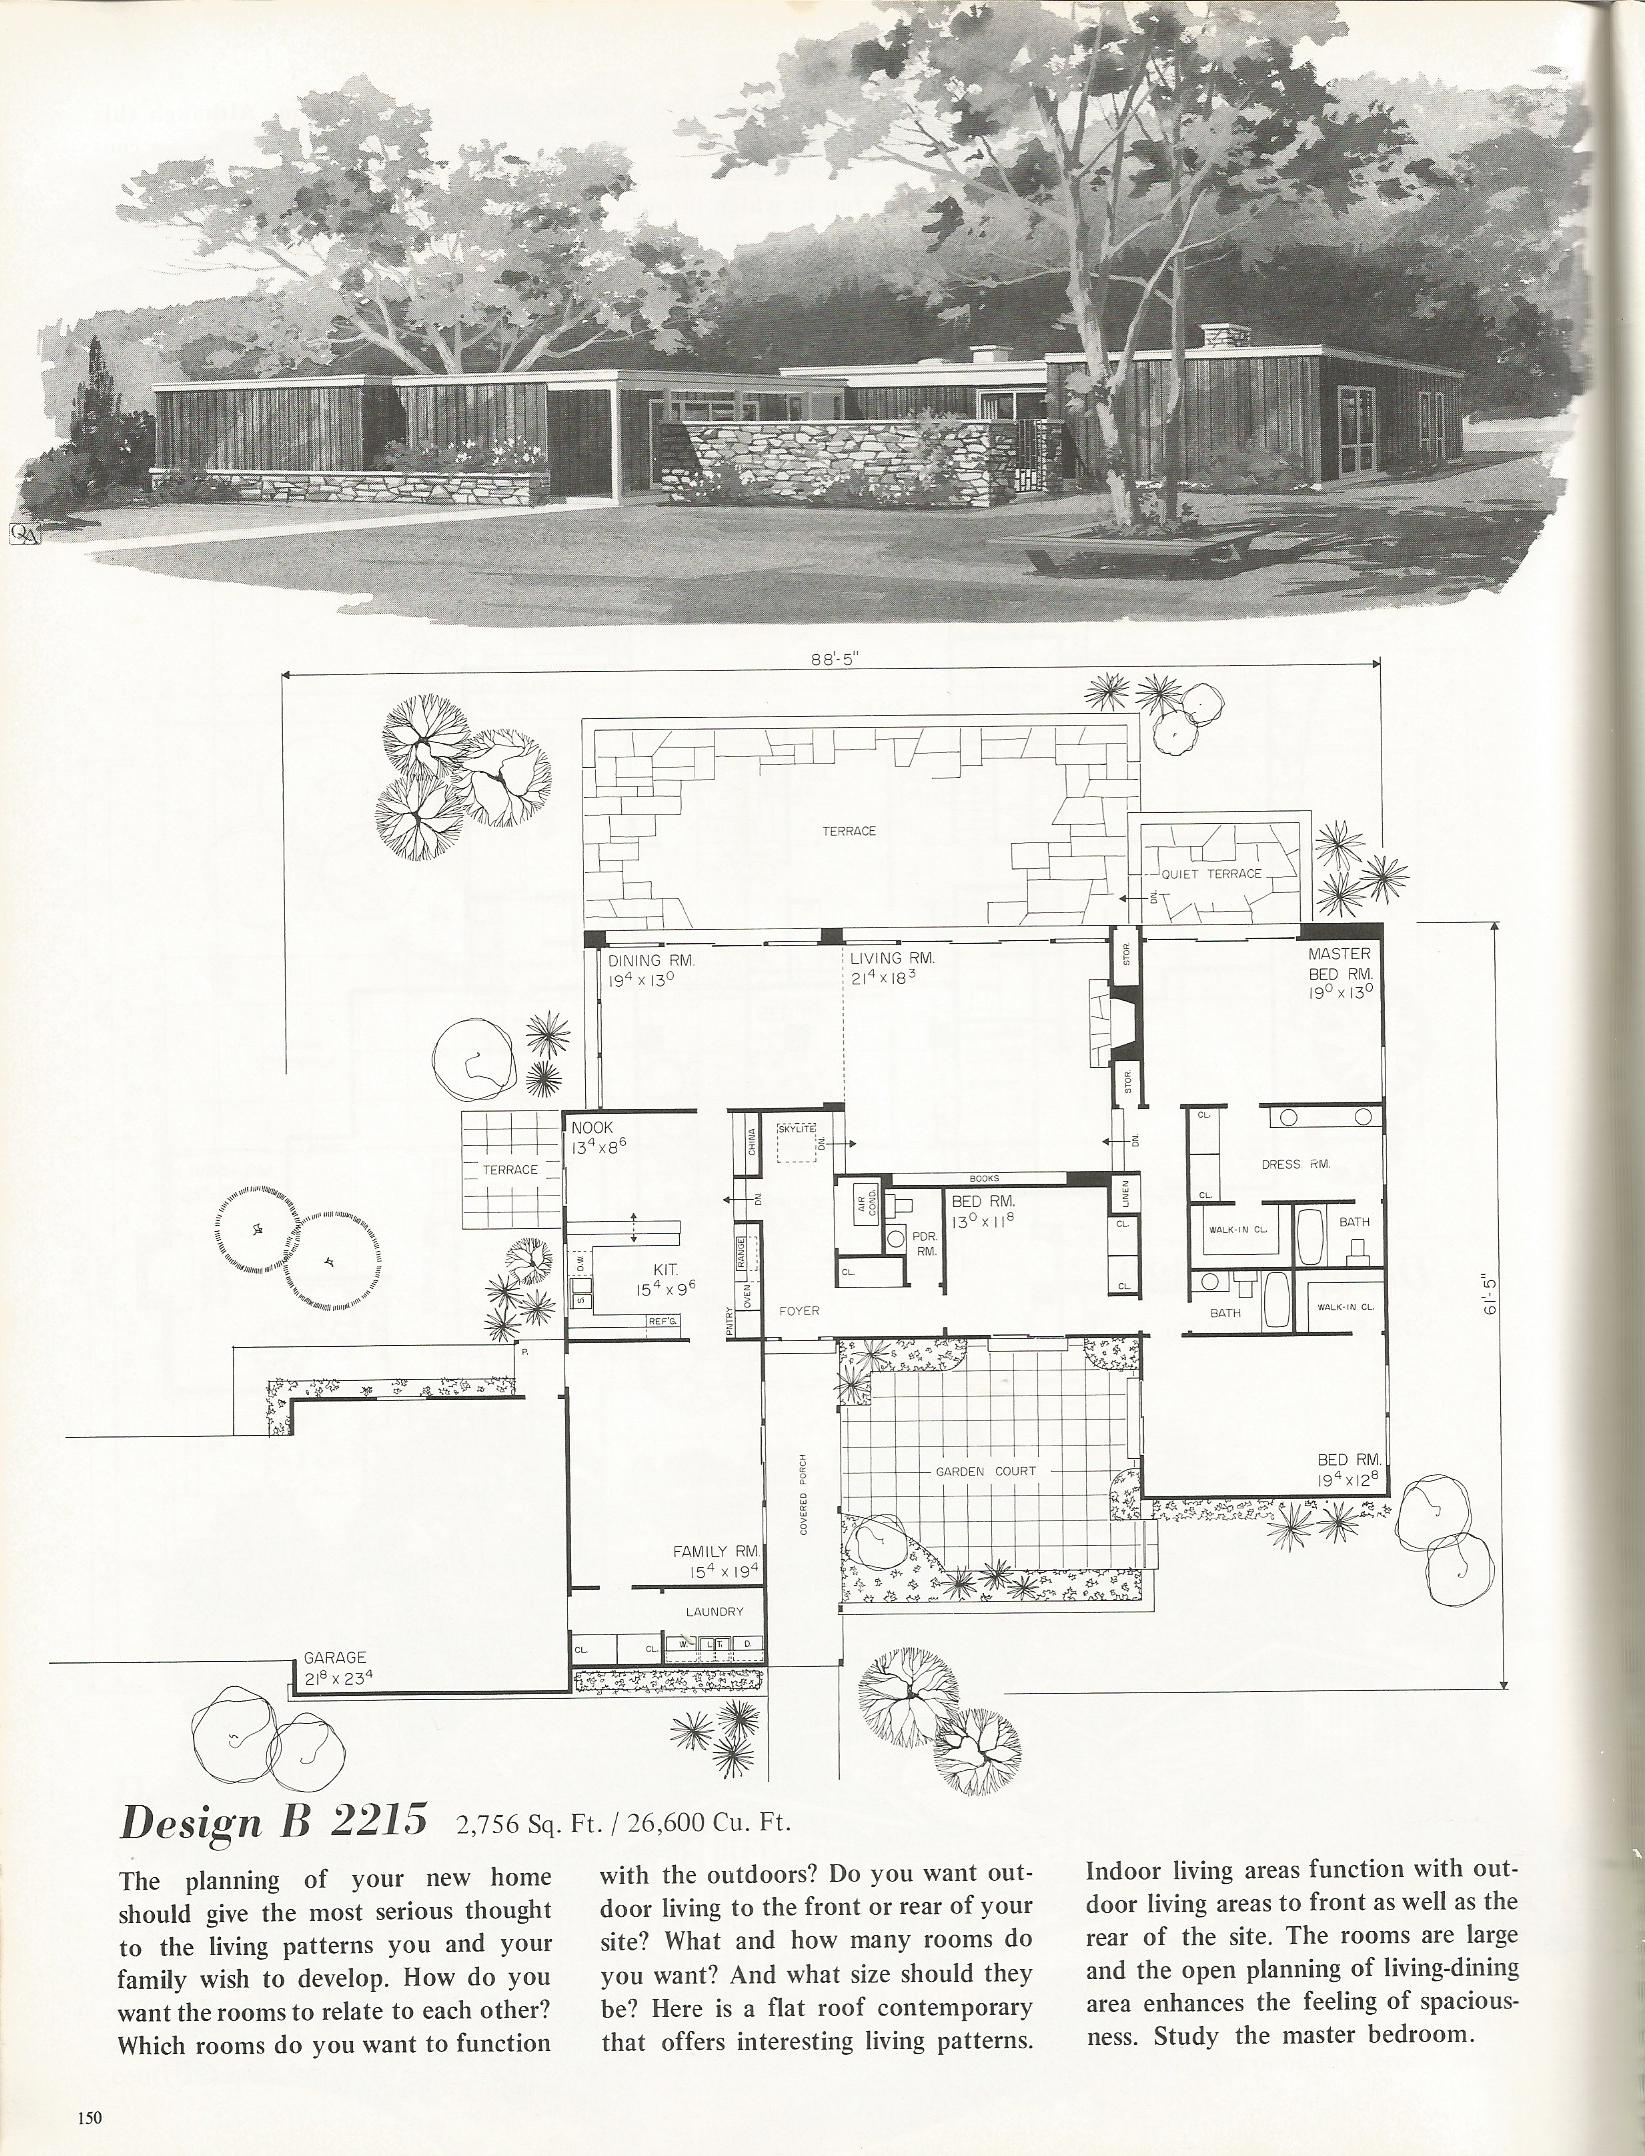 Vintage house plans 2215 antique alter ego for Retro modern house plans